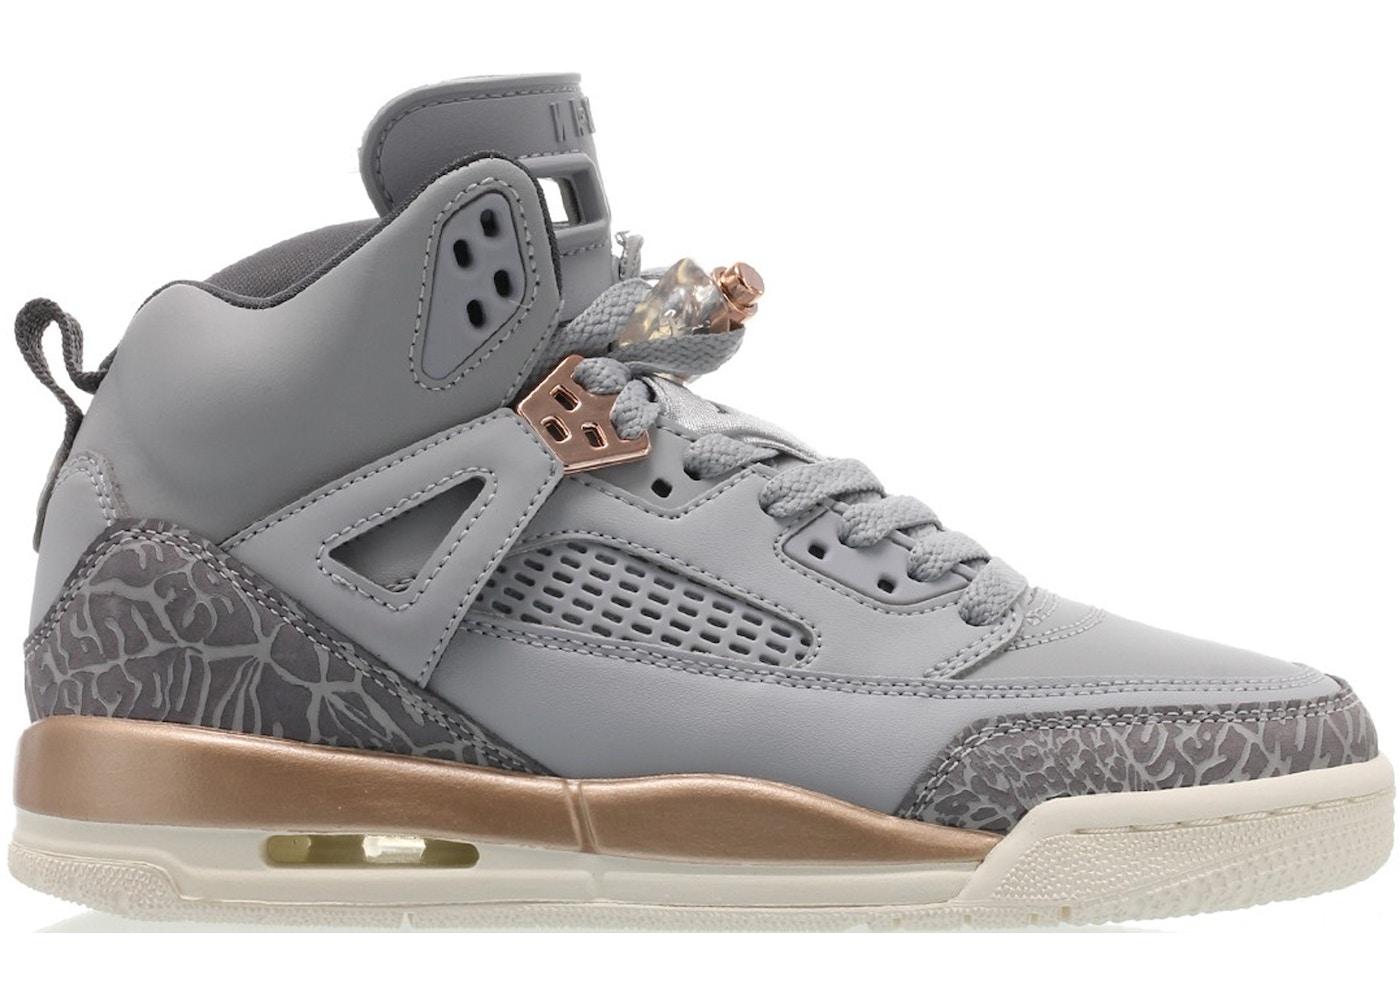 official photos c27ae 174fa Air Jordan Spizike Shoes - Release Date